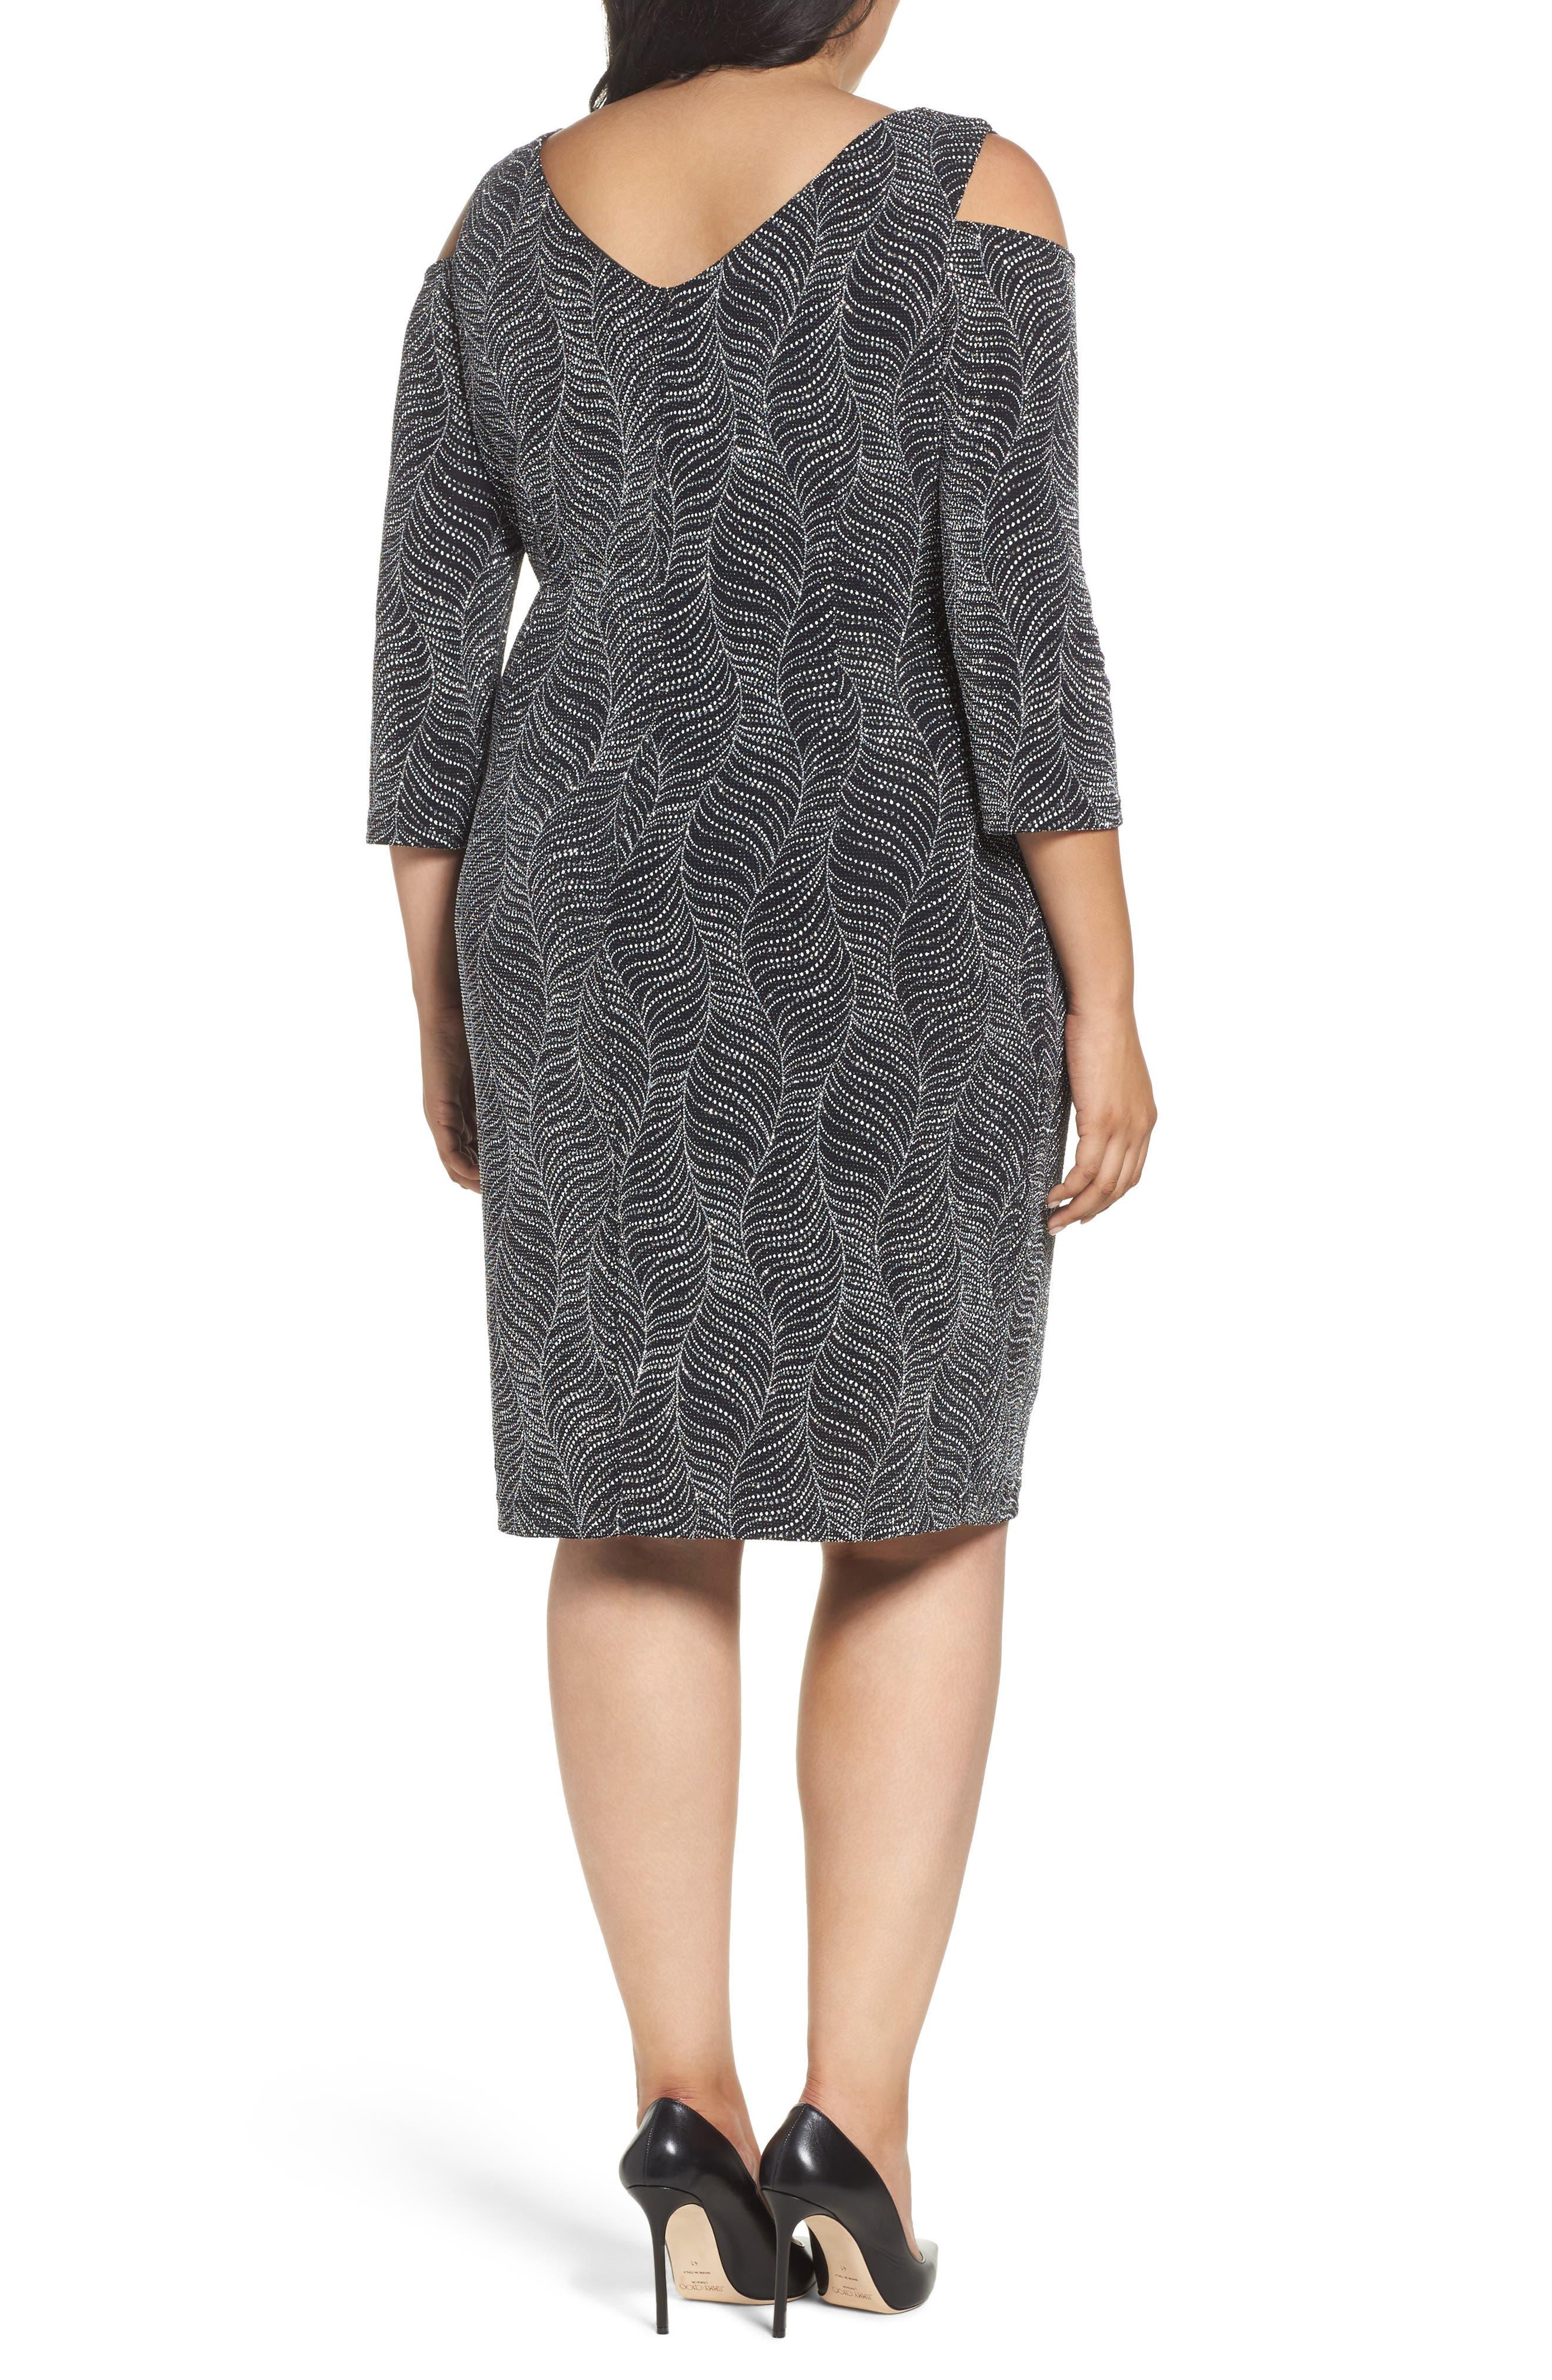 Cold Shoulder Glitter Knit Sheath Dress,                             Alternate thumbnail 2, color,                             Black/ Silver